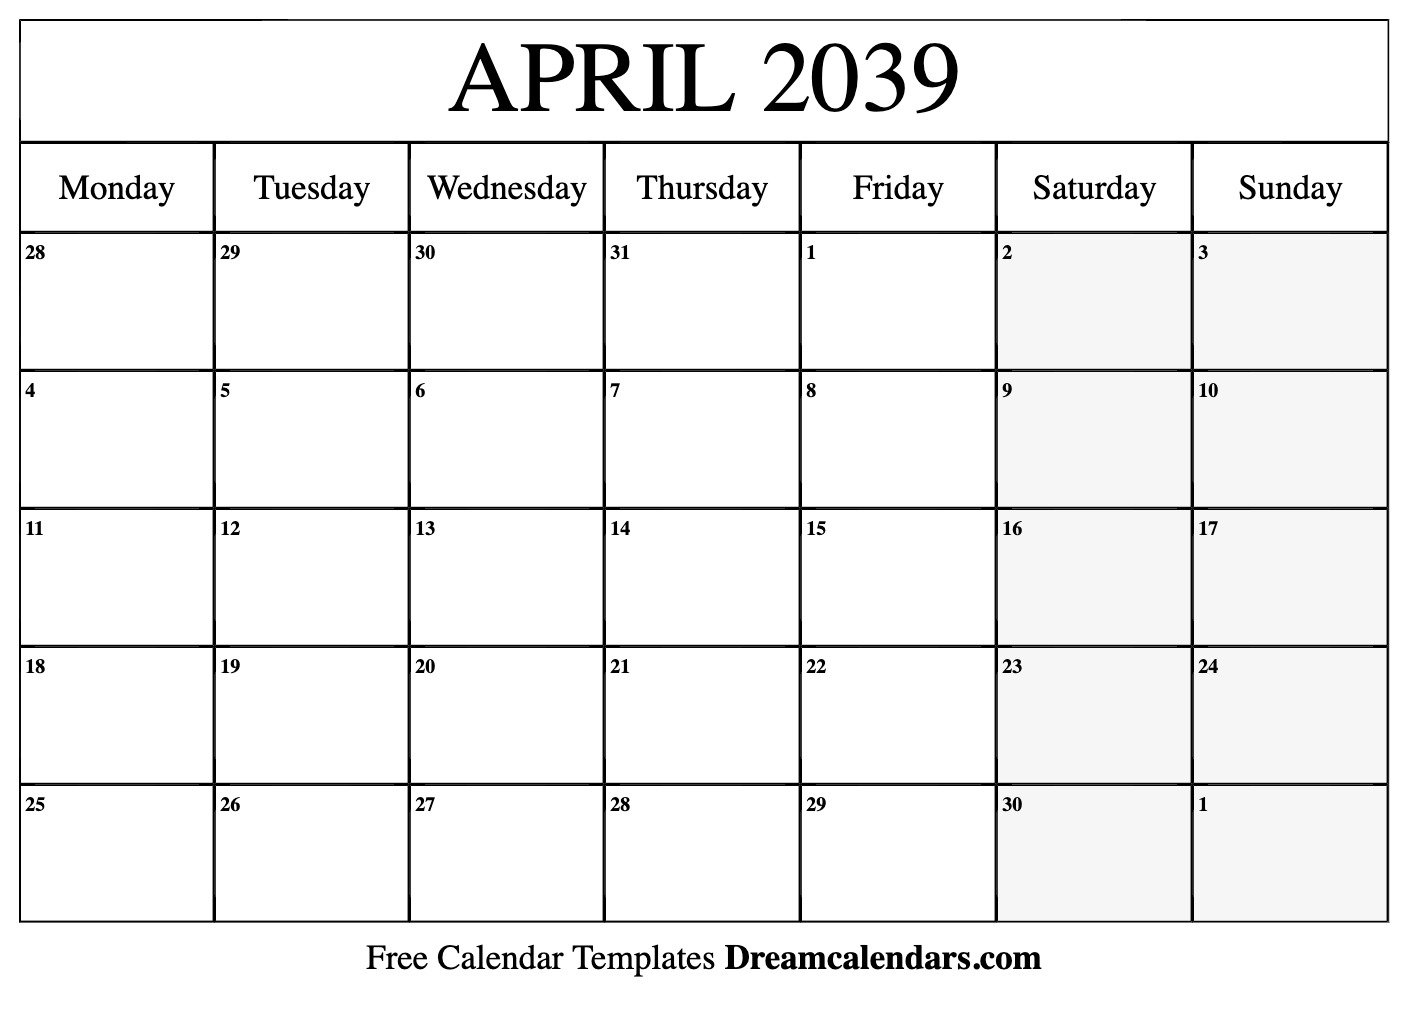 Printable April 2039 Calendar regarding Calendar Sunset Sunrise Length Printable